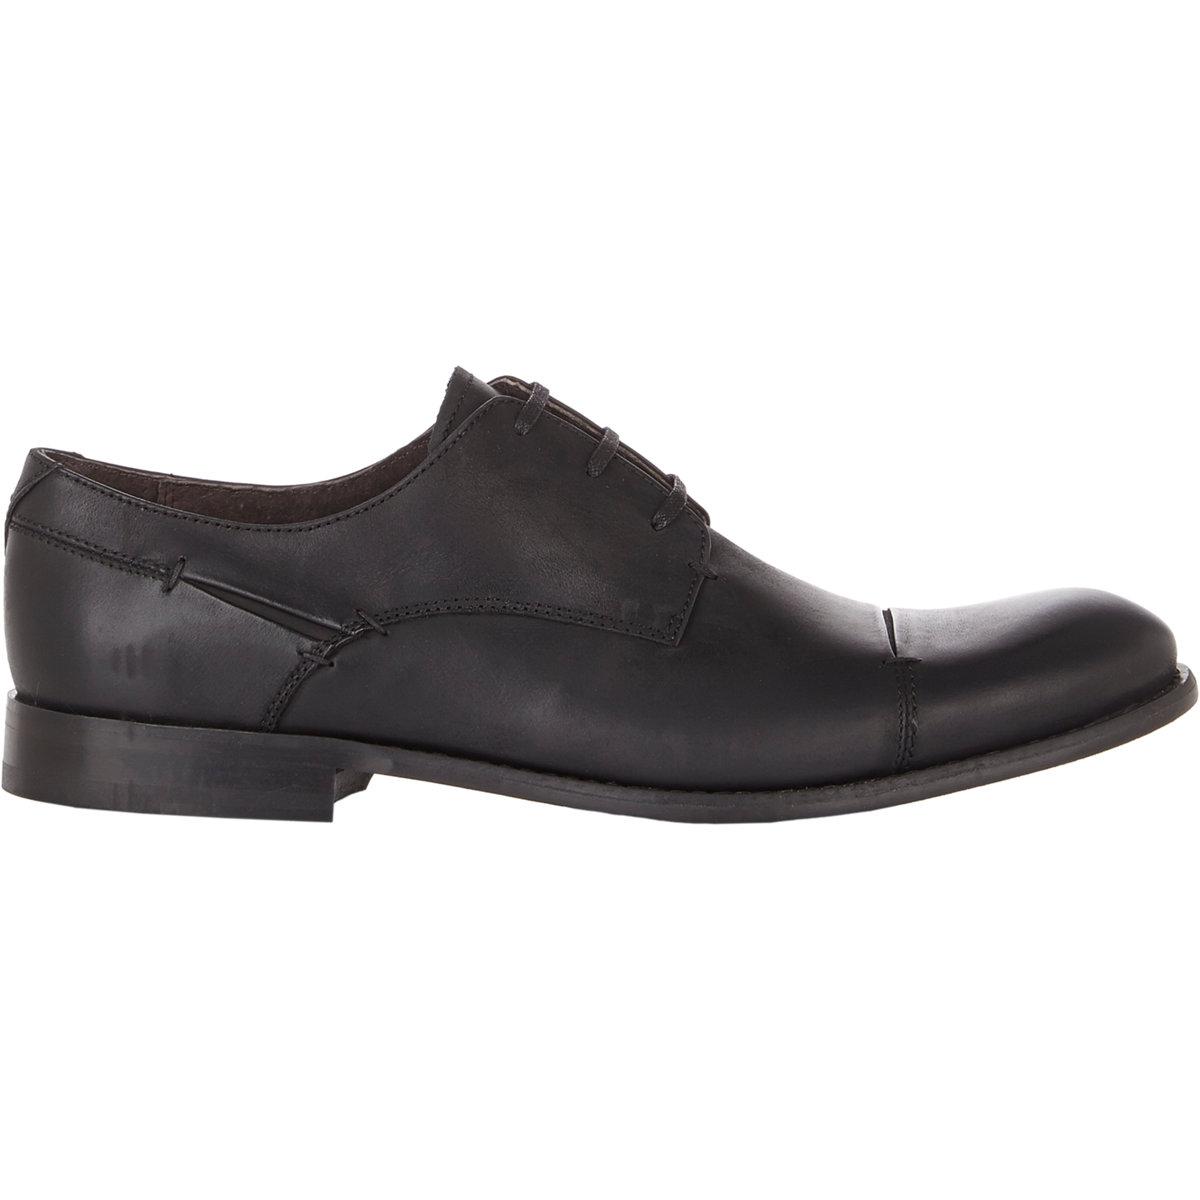 John Varvatos Shoe Laces